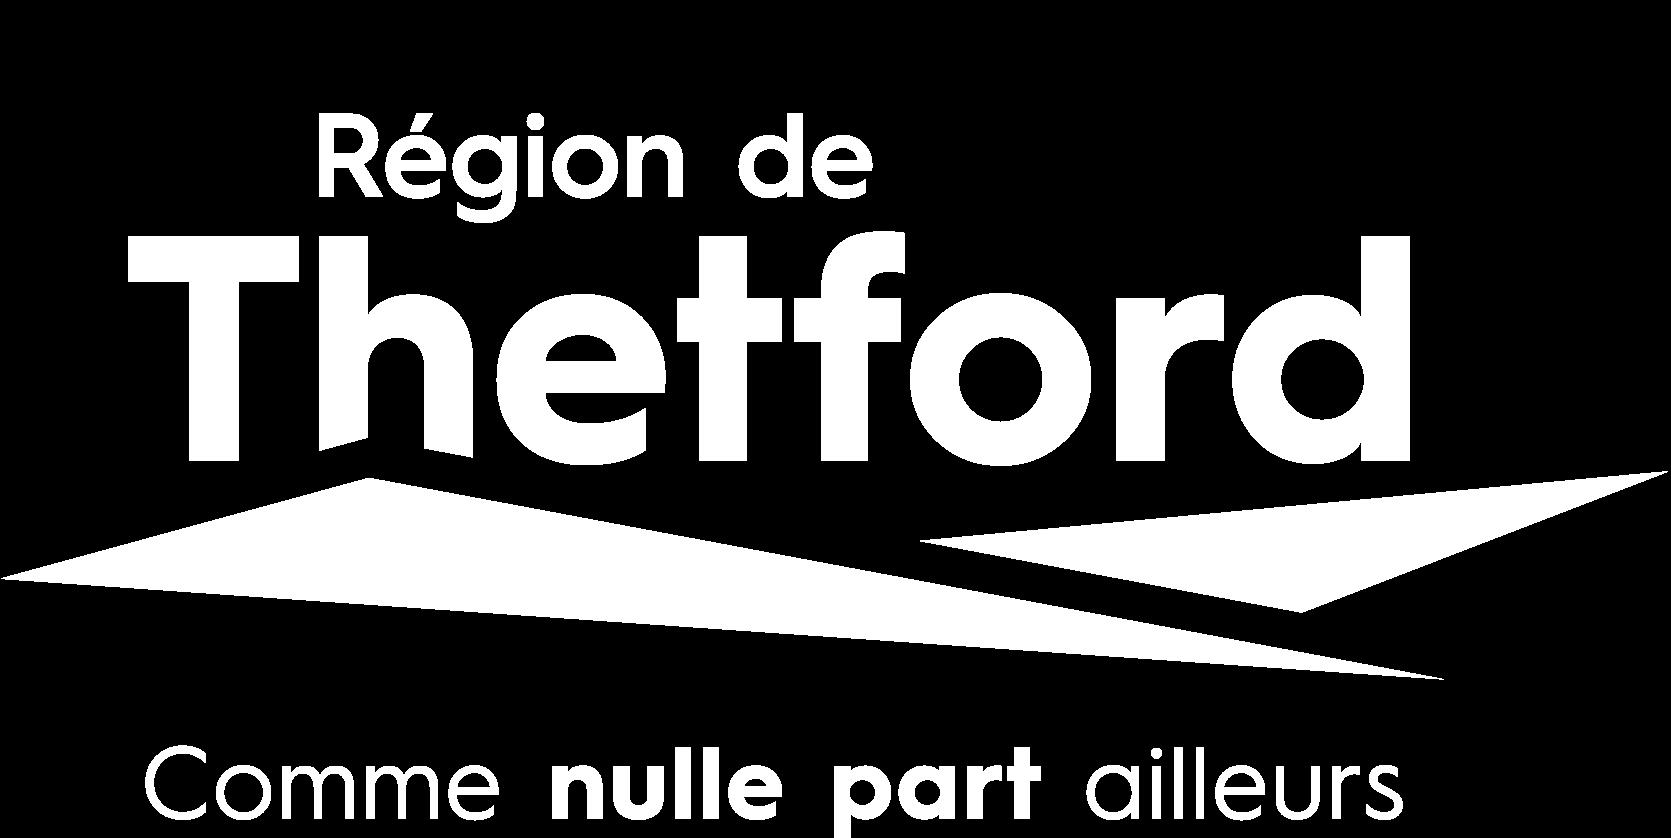 Région de Thetford